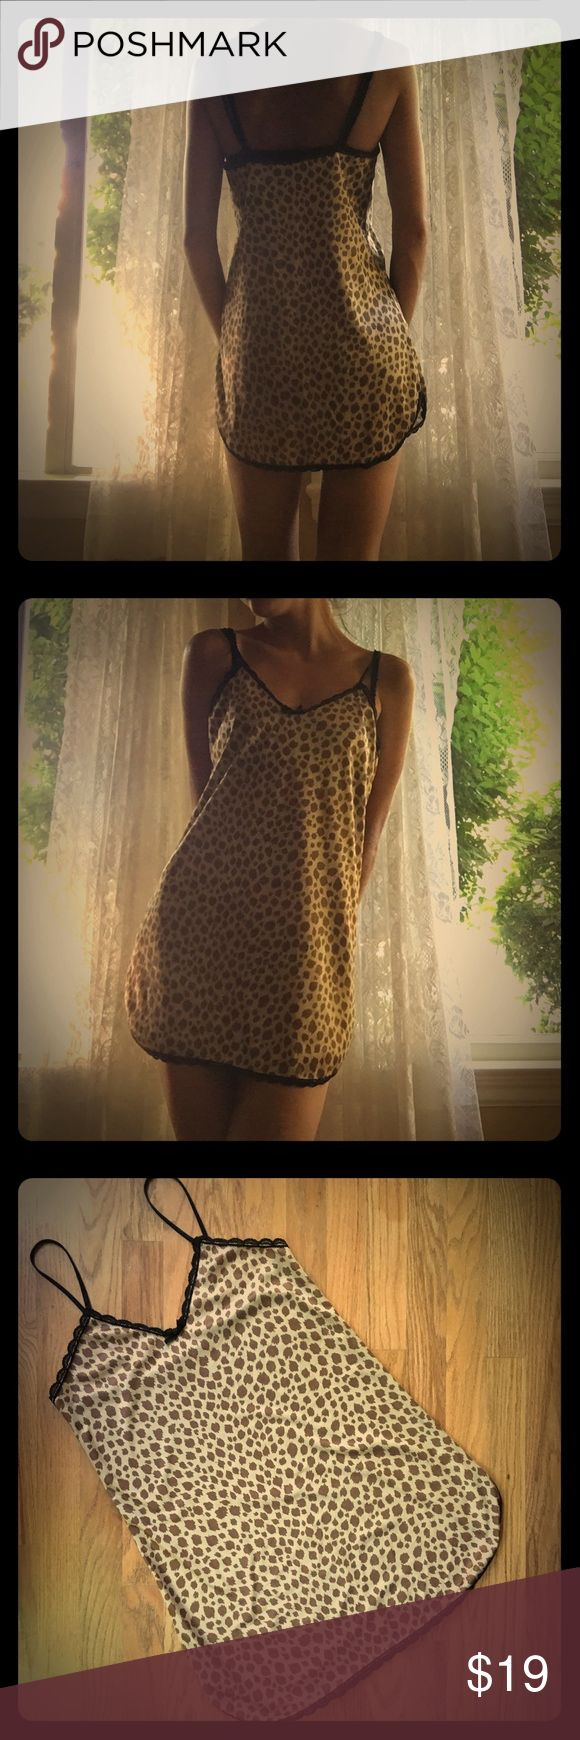 Animal Print Lingerie Slip Dress Animal Print Lingerie Slip Dress! Leopard Cheetah Animal Print... black borders, super soft and comfy!! No flaws! Size small! Vintage Intimates & Sleepwear Chemises & Slips